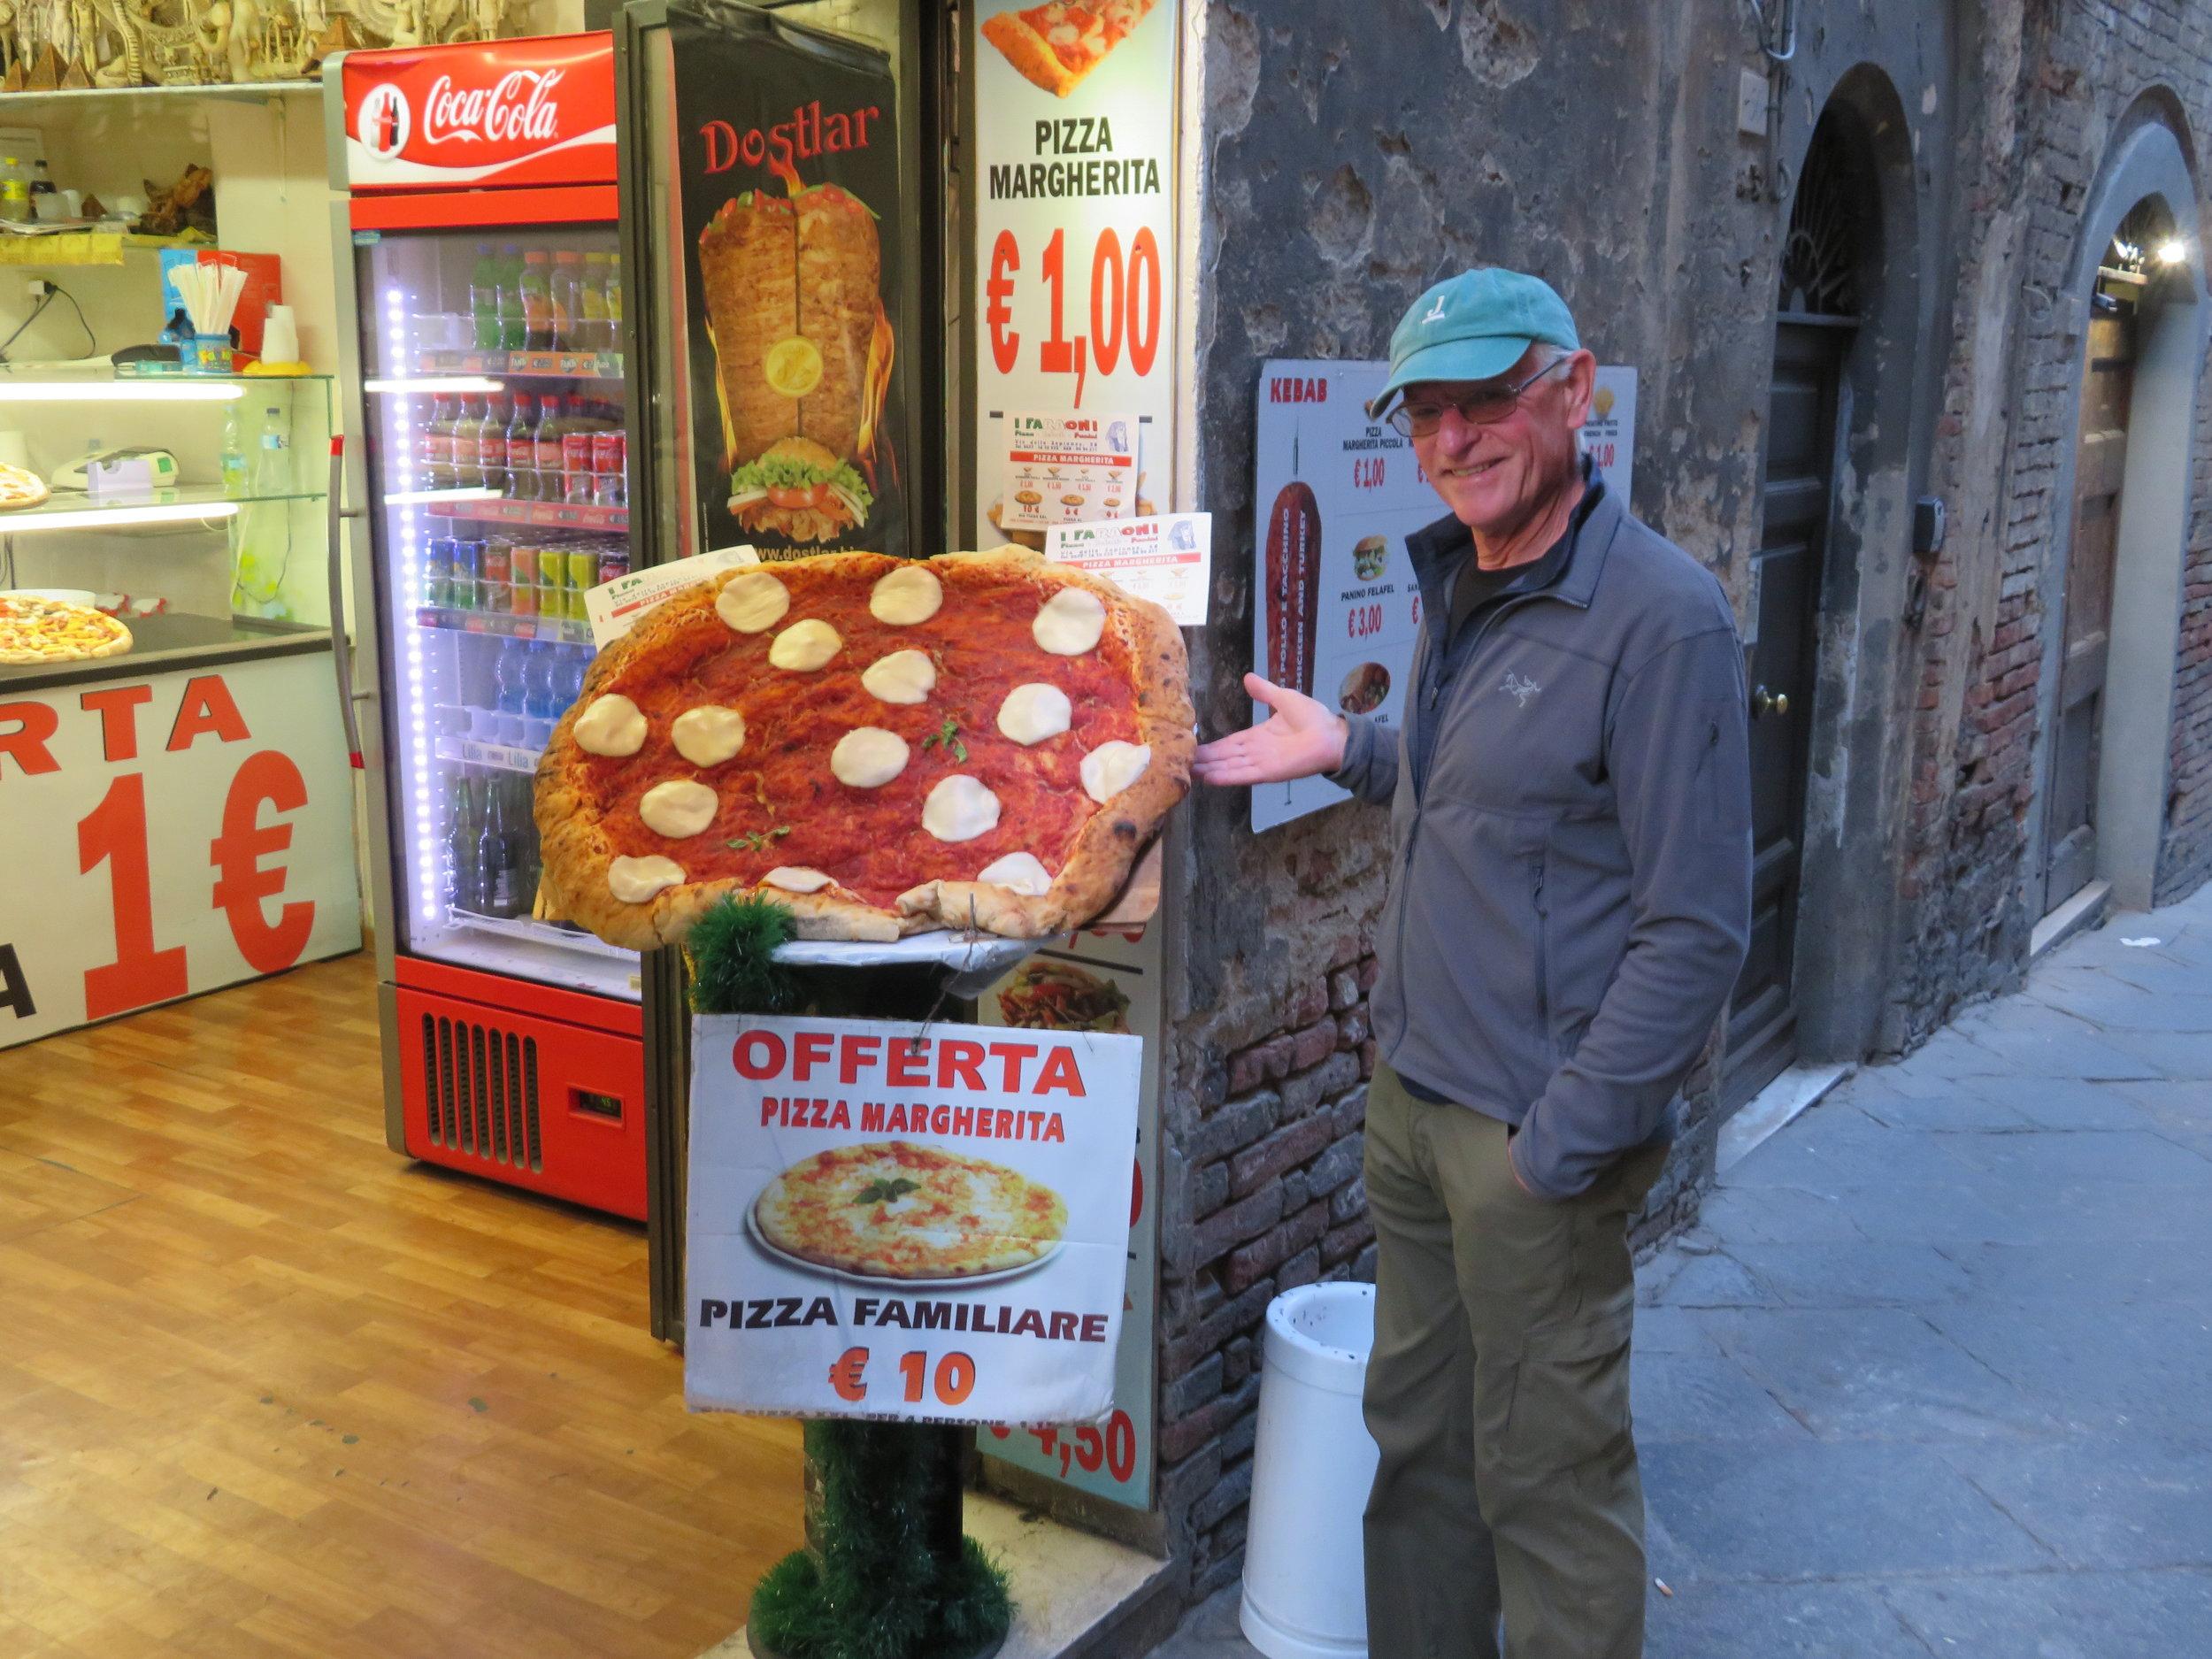 No shortage of pizza in Italy